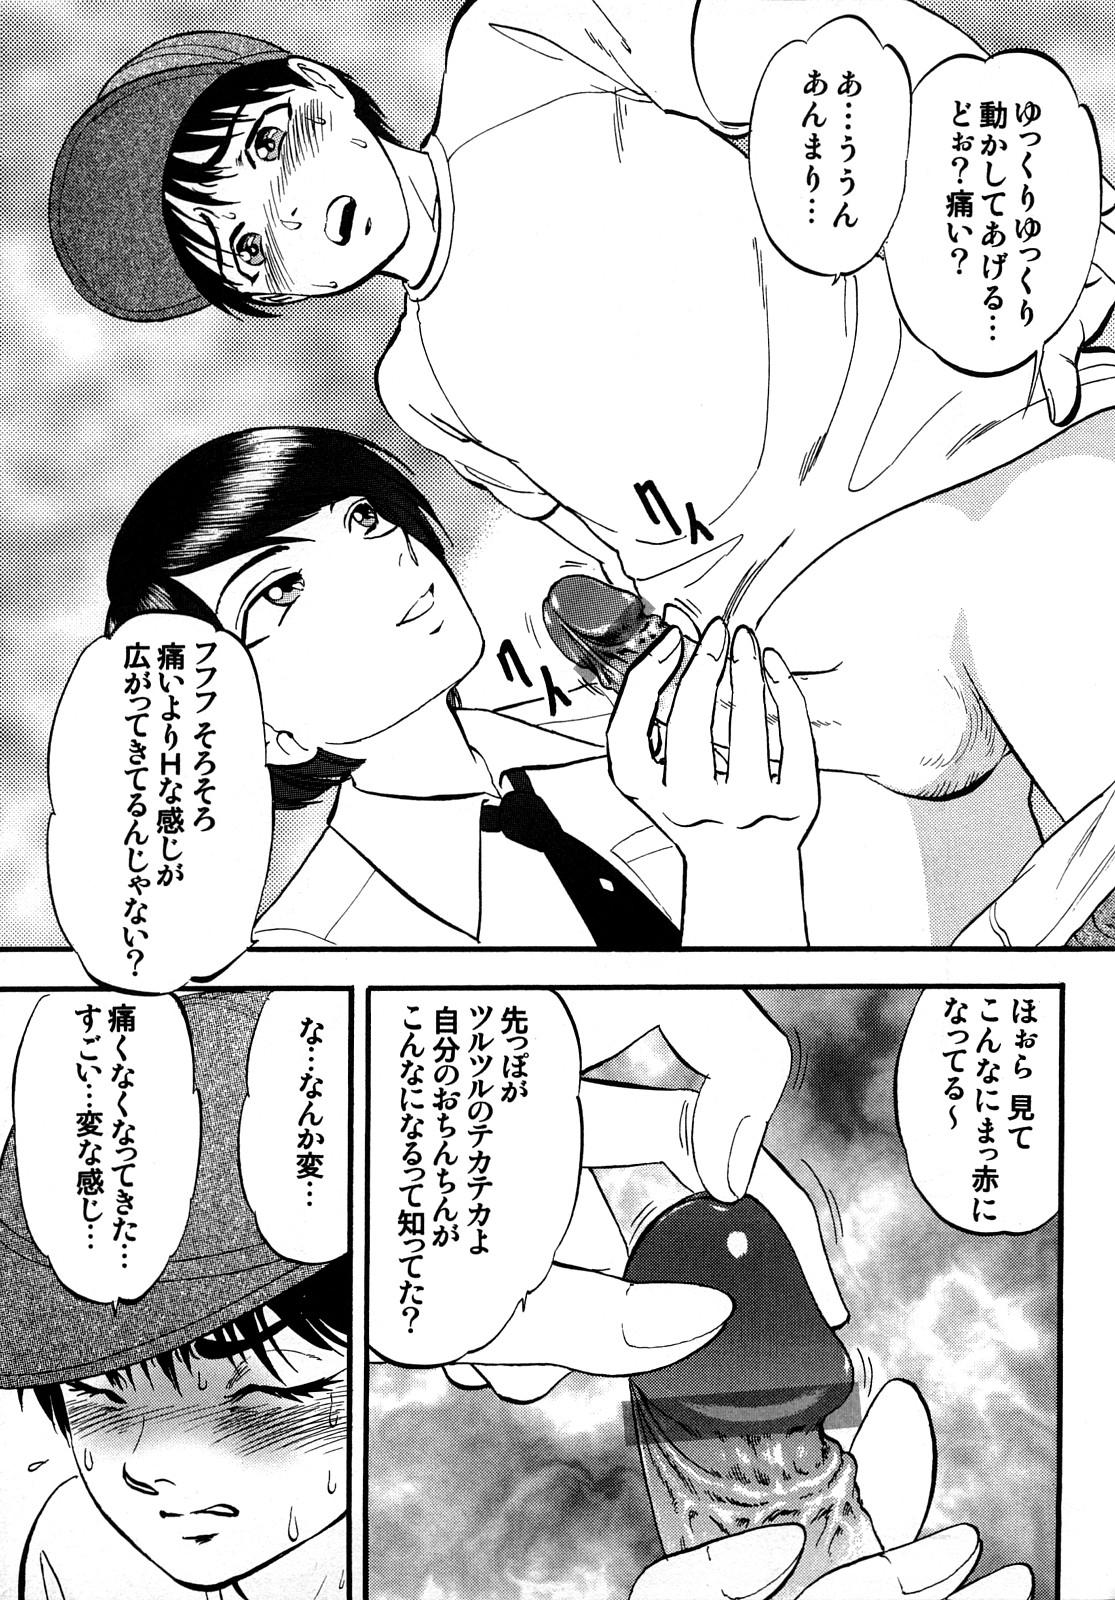 R Shitei Jou 172